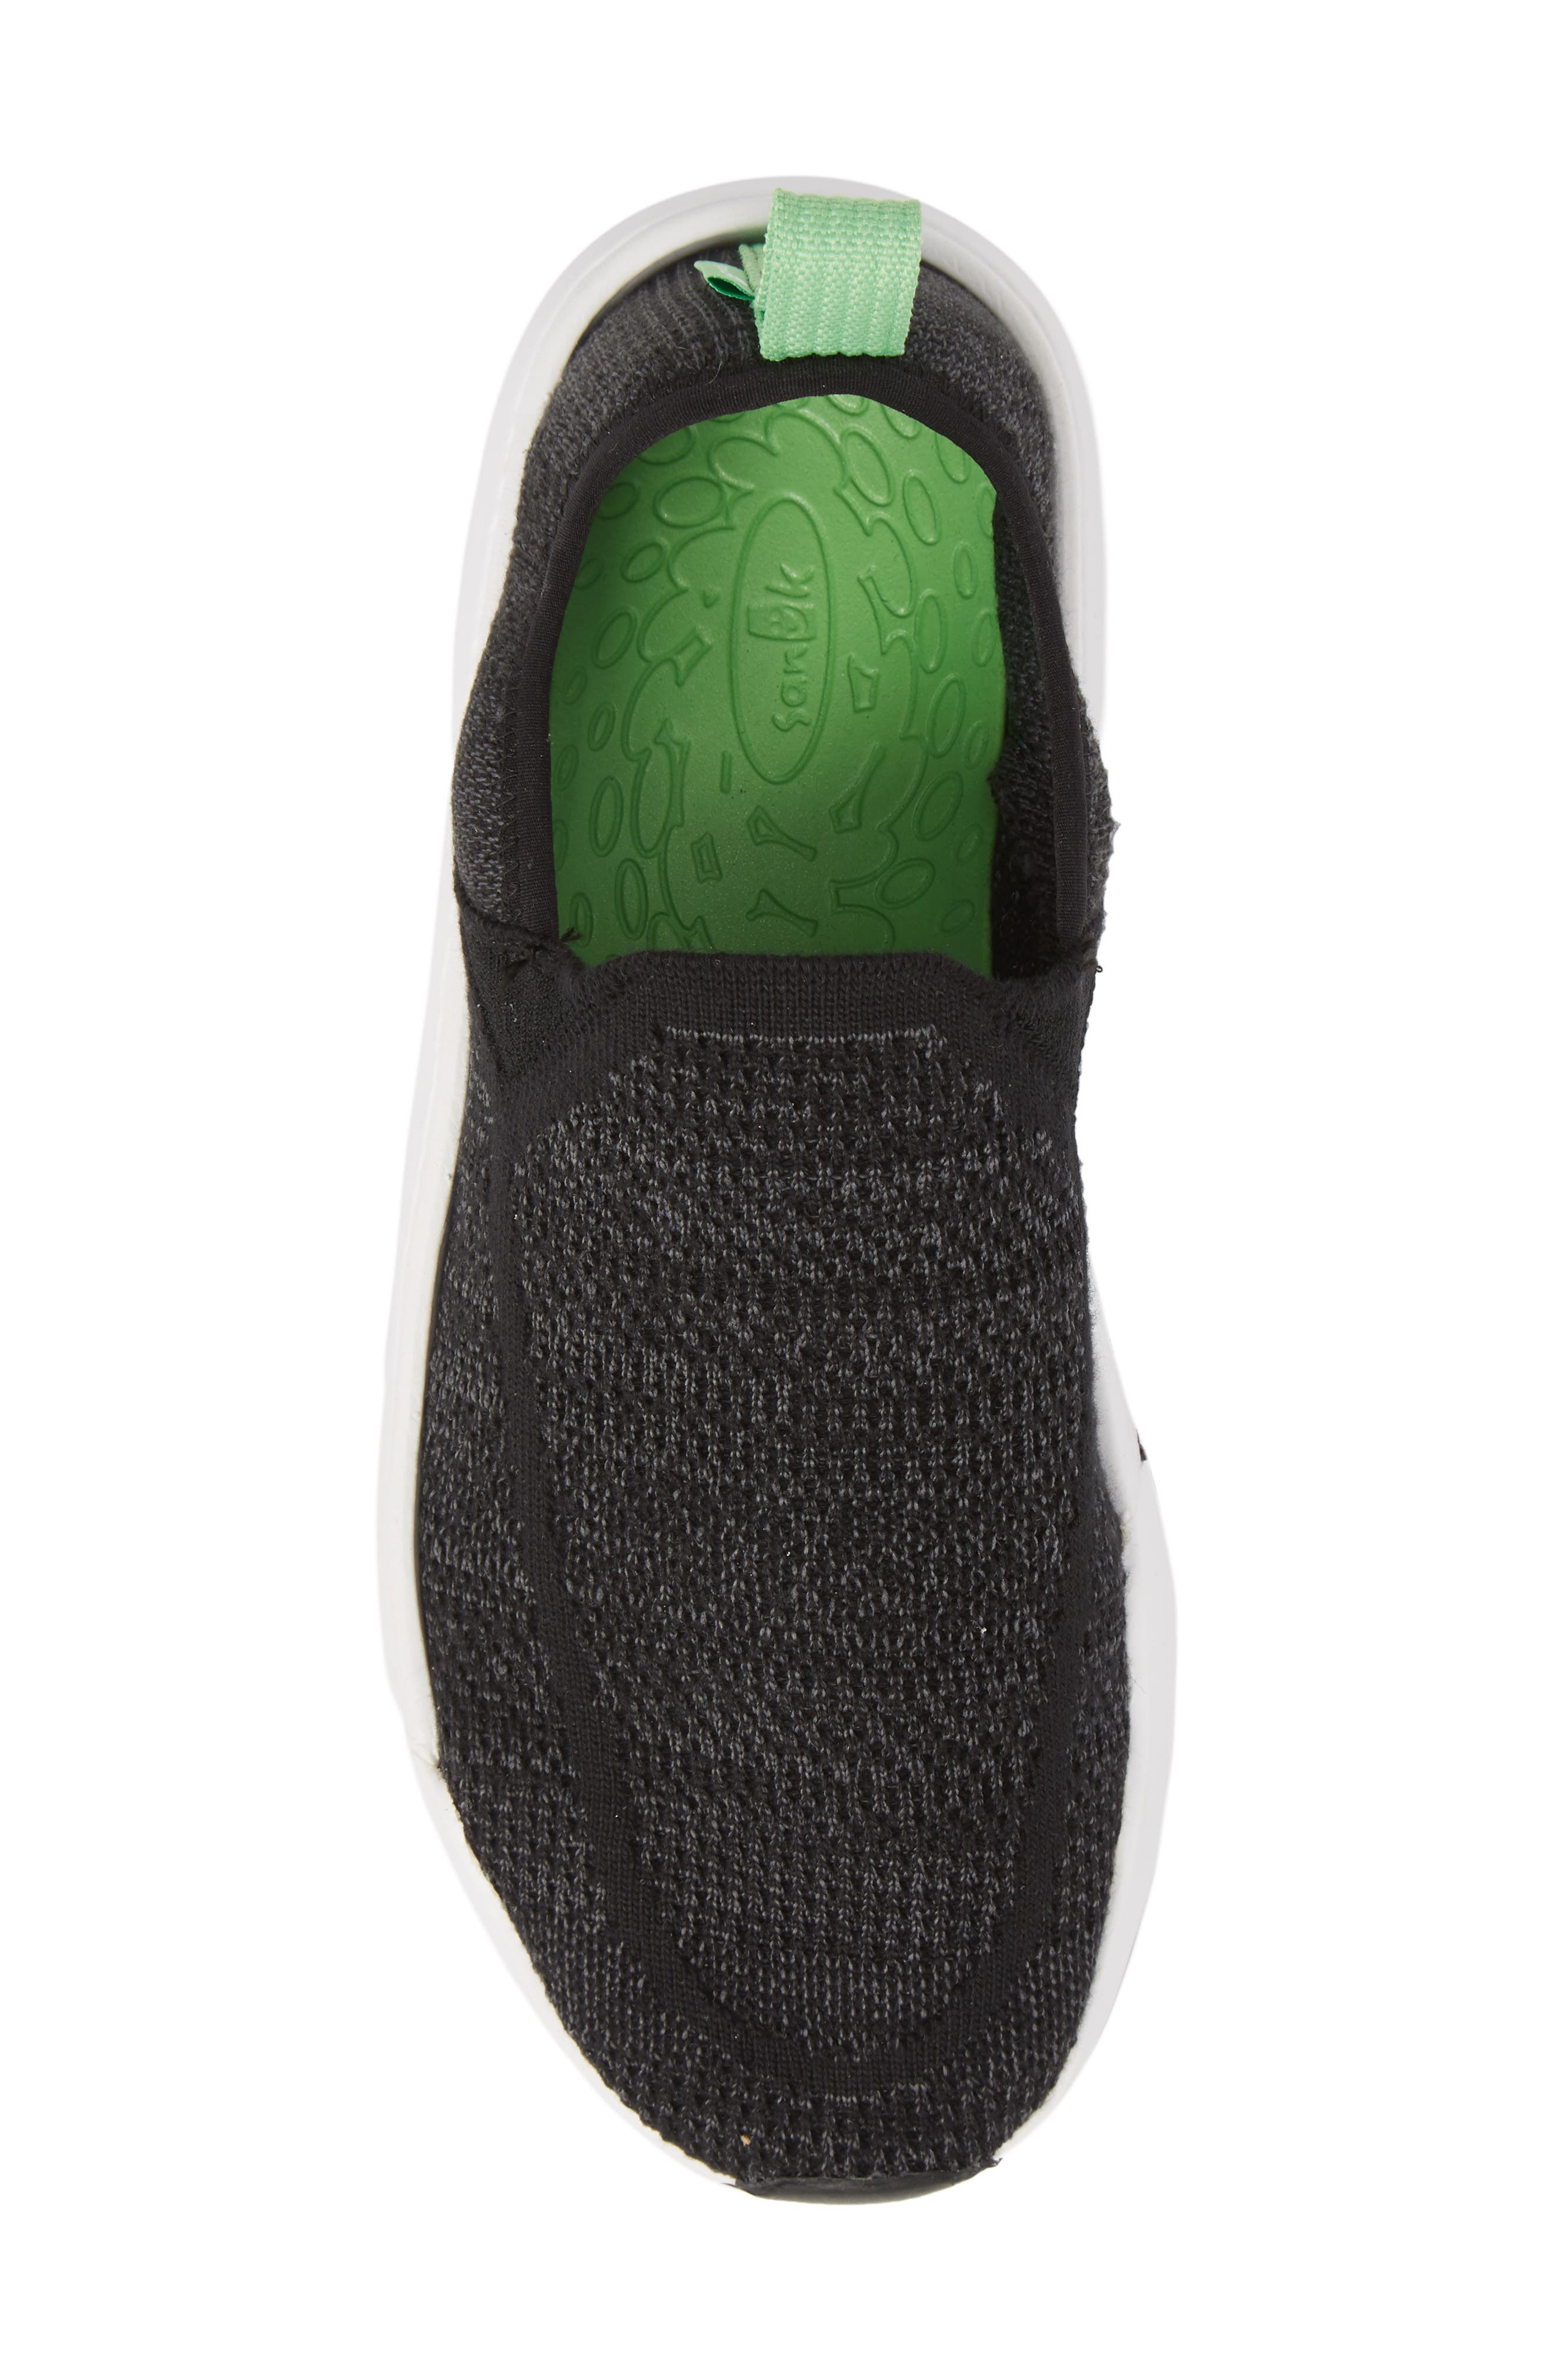 Chiba Quest Knit Slip-On Sneaker,                             Alternate thumbnail 5, color,                             Black